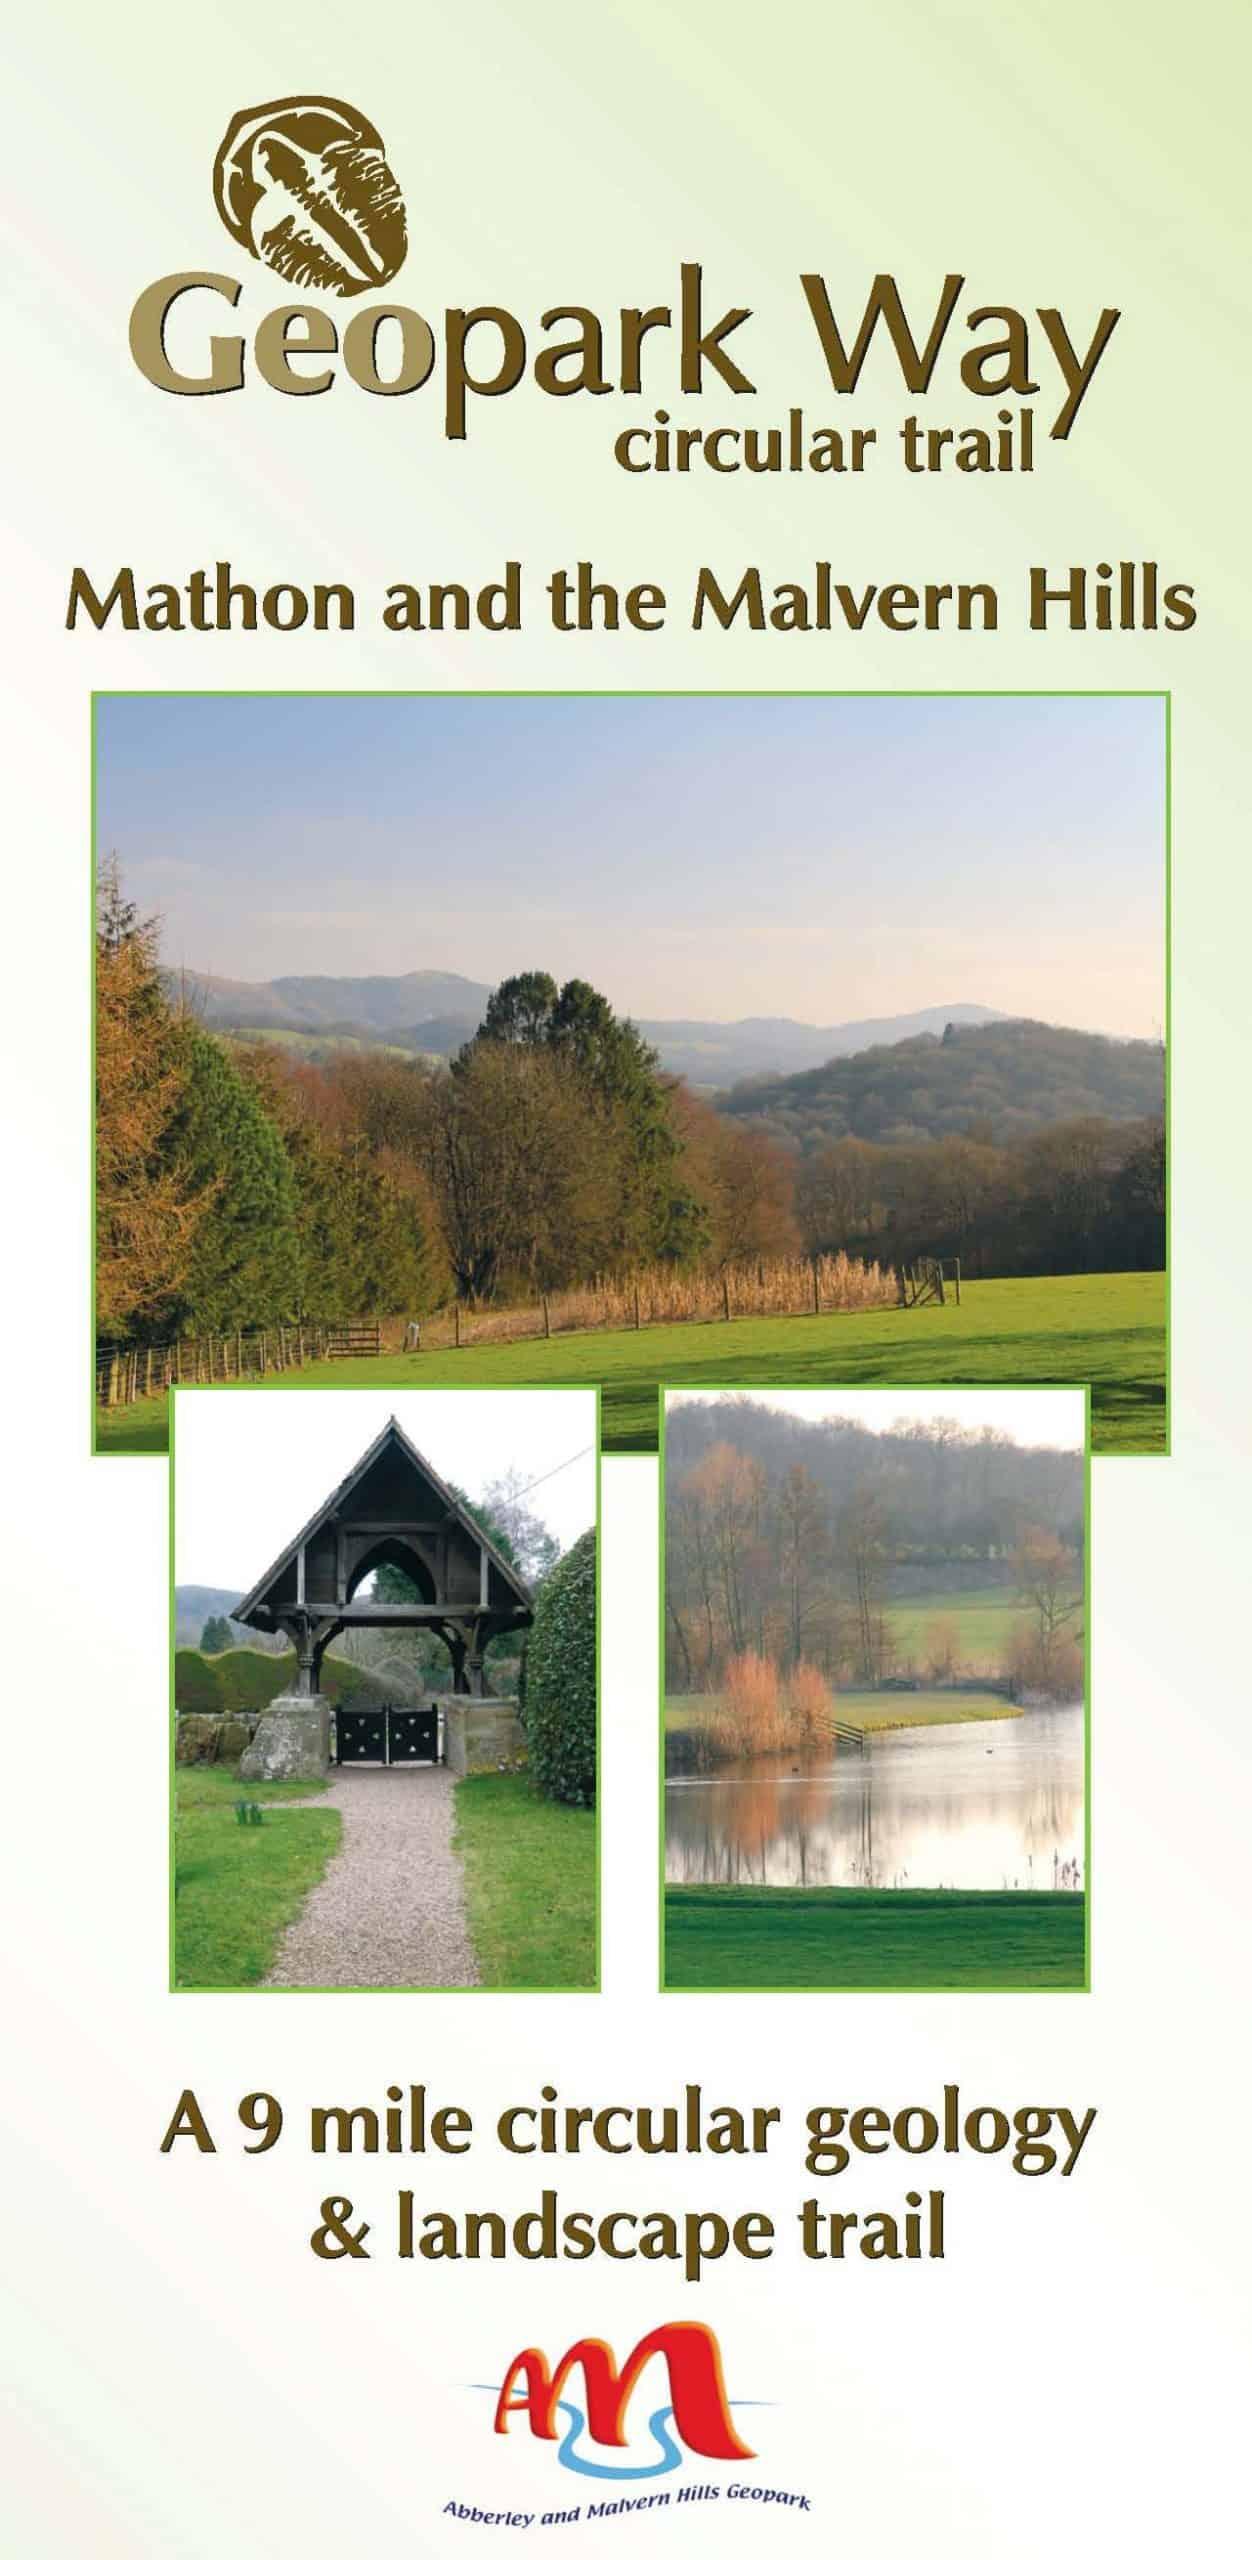 Mathon and Malvern Hills circular trail